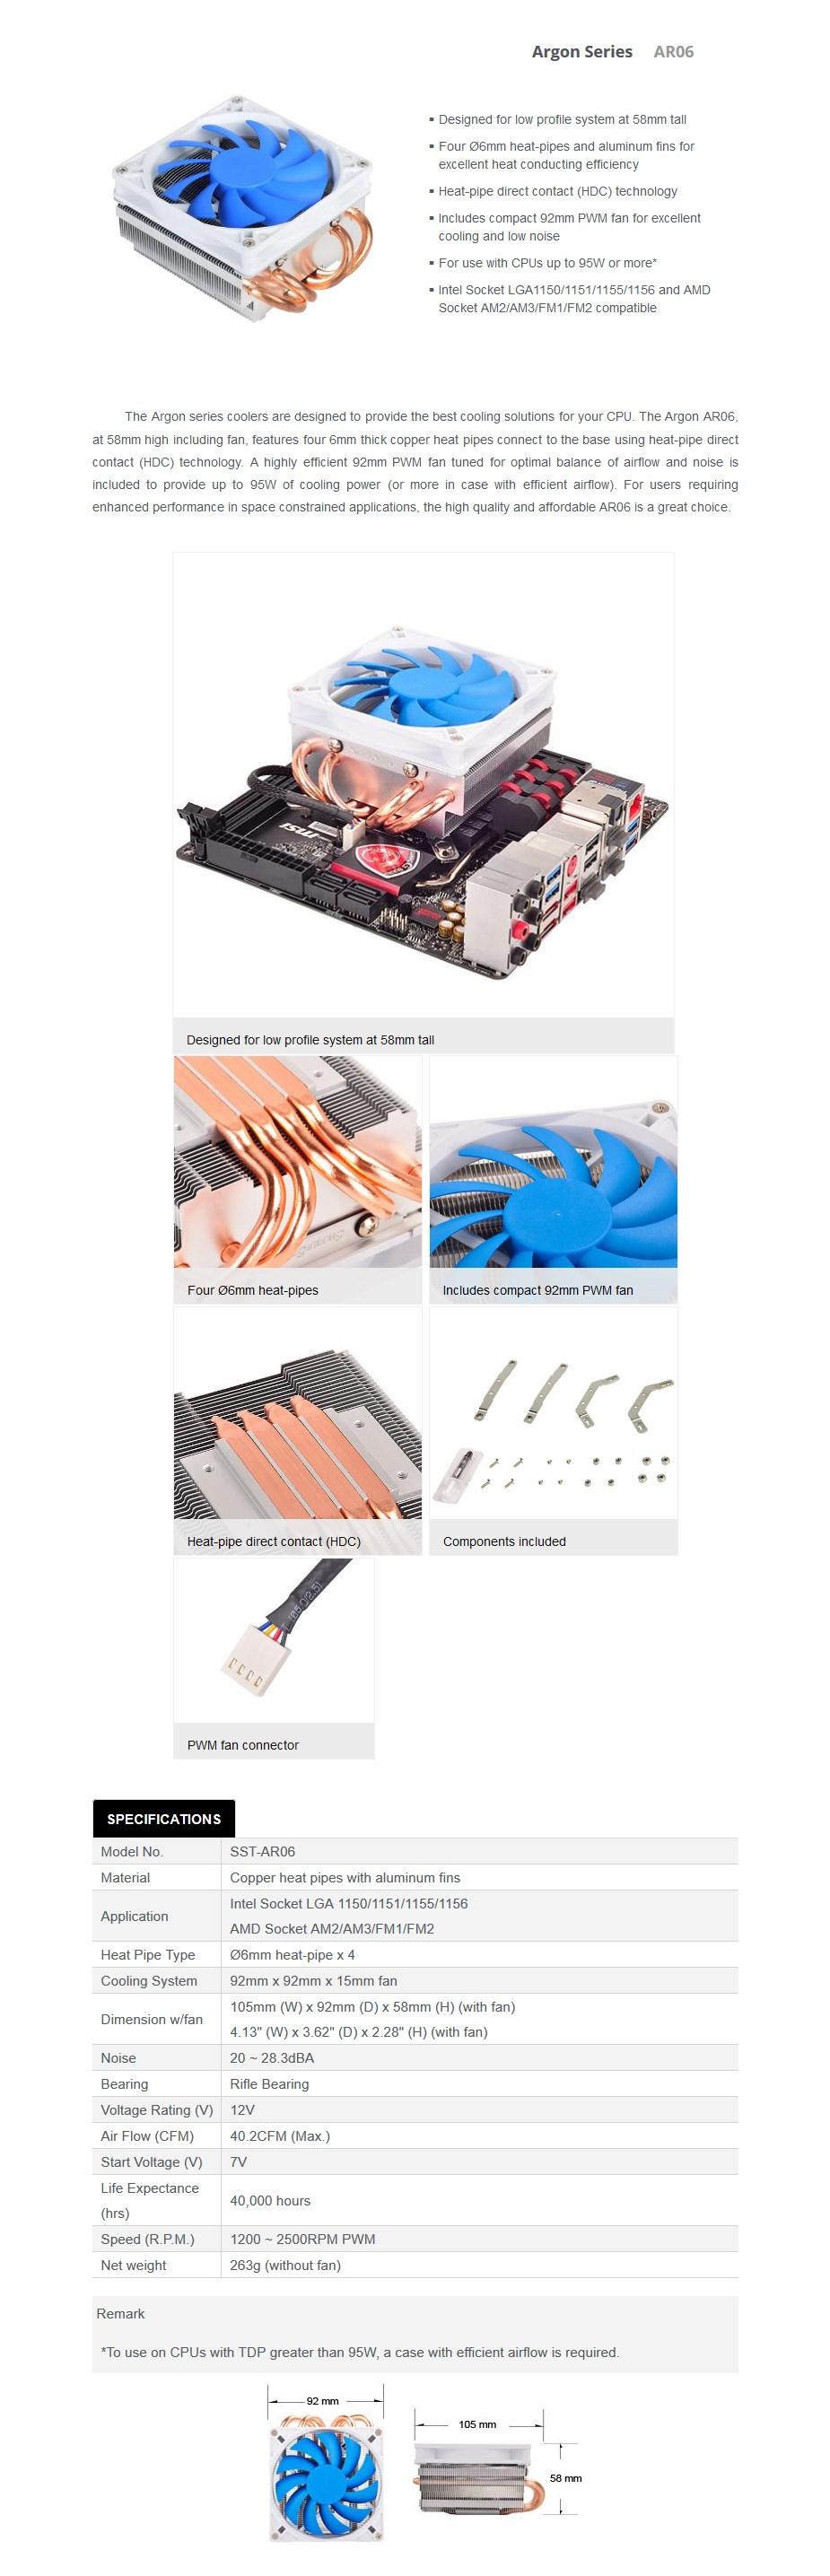 SilverStone Argon AR06 Low Profile CPU Air Cooler - Desktop Overview 1